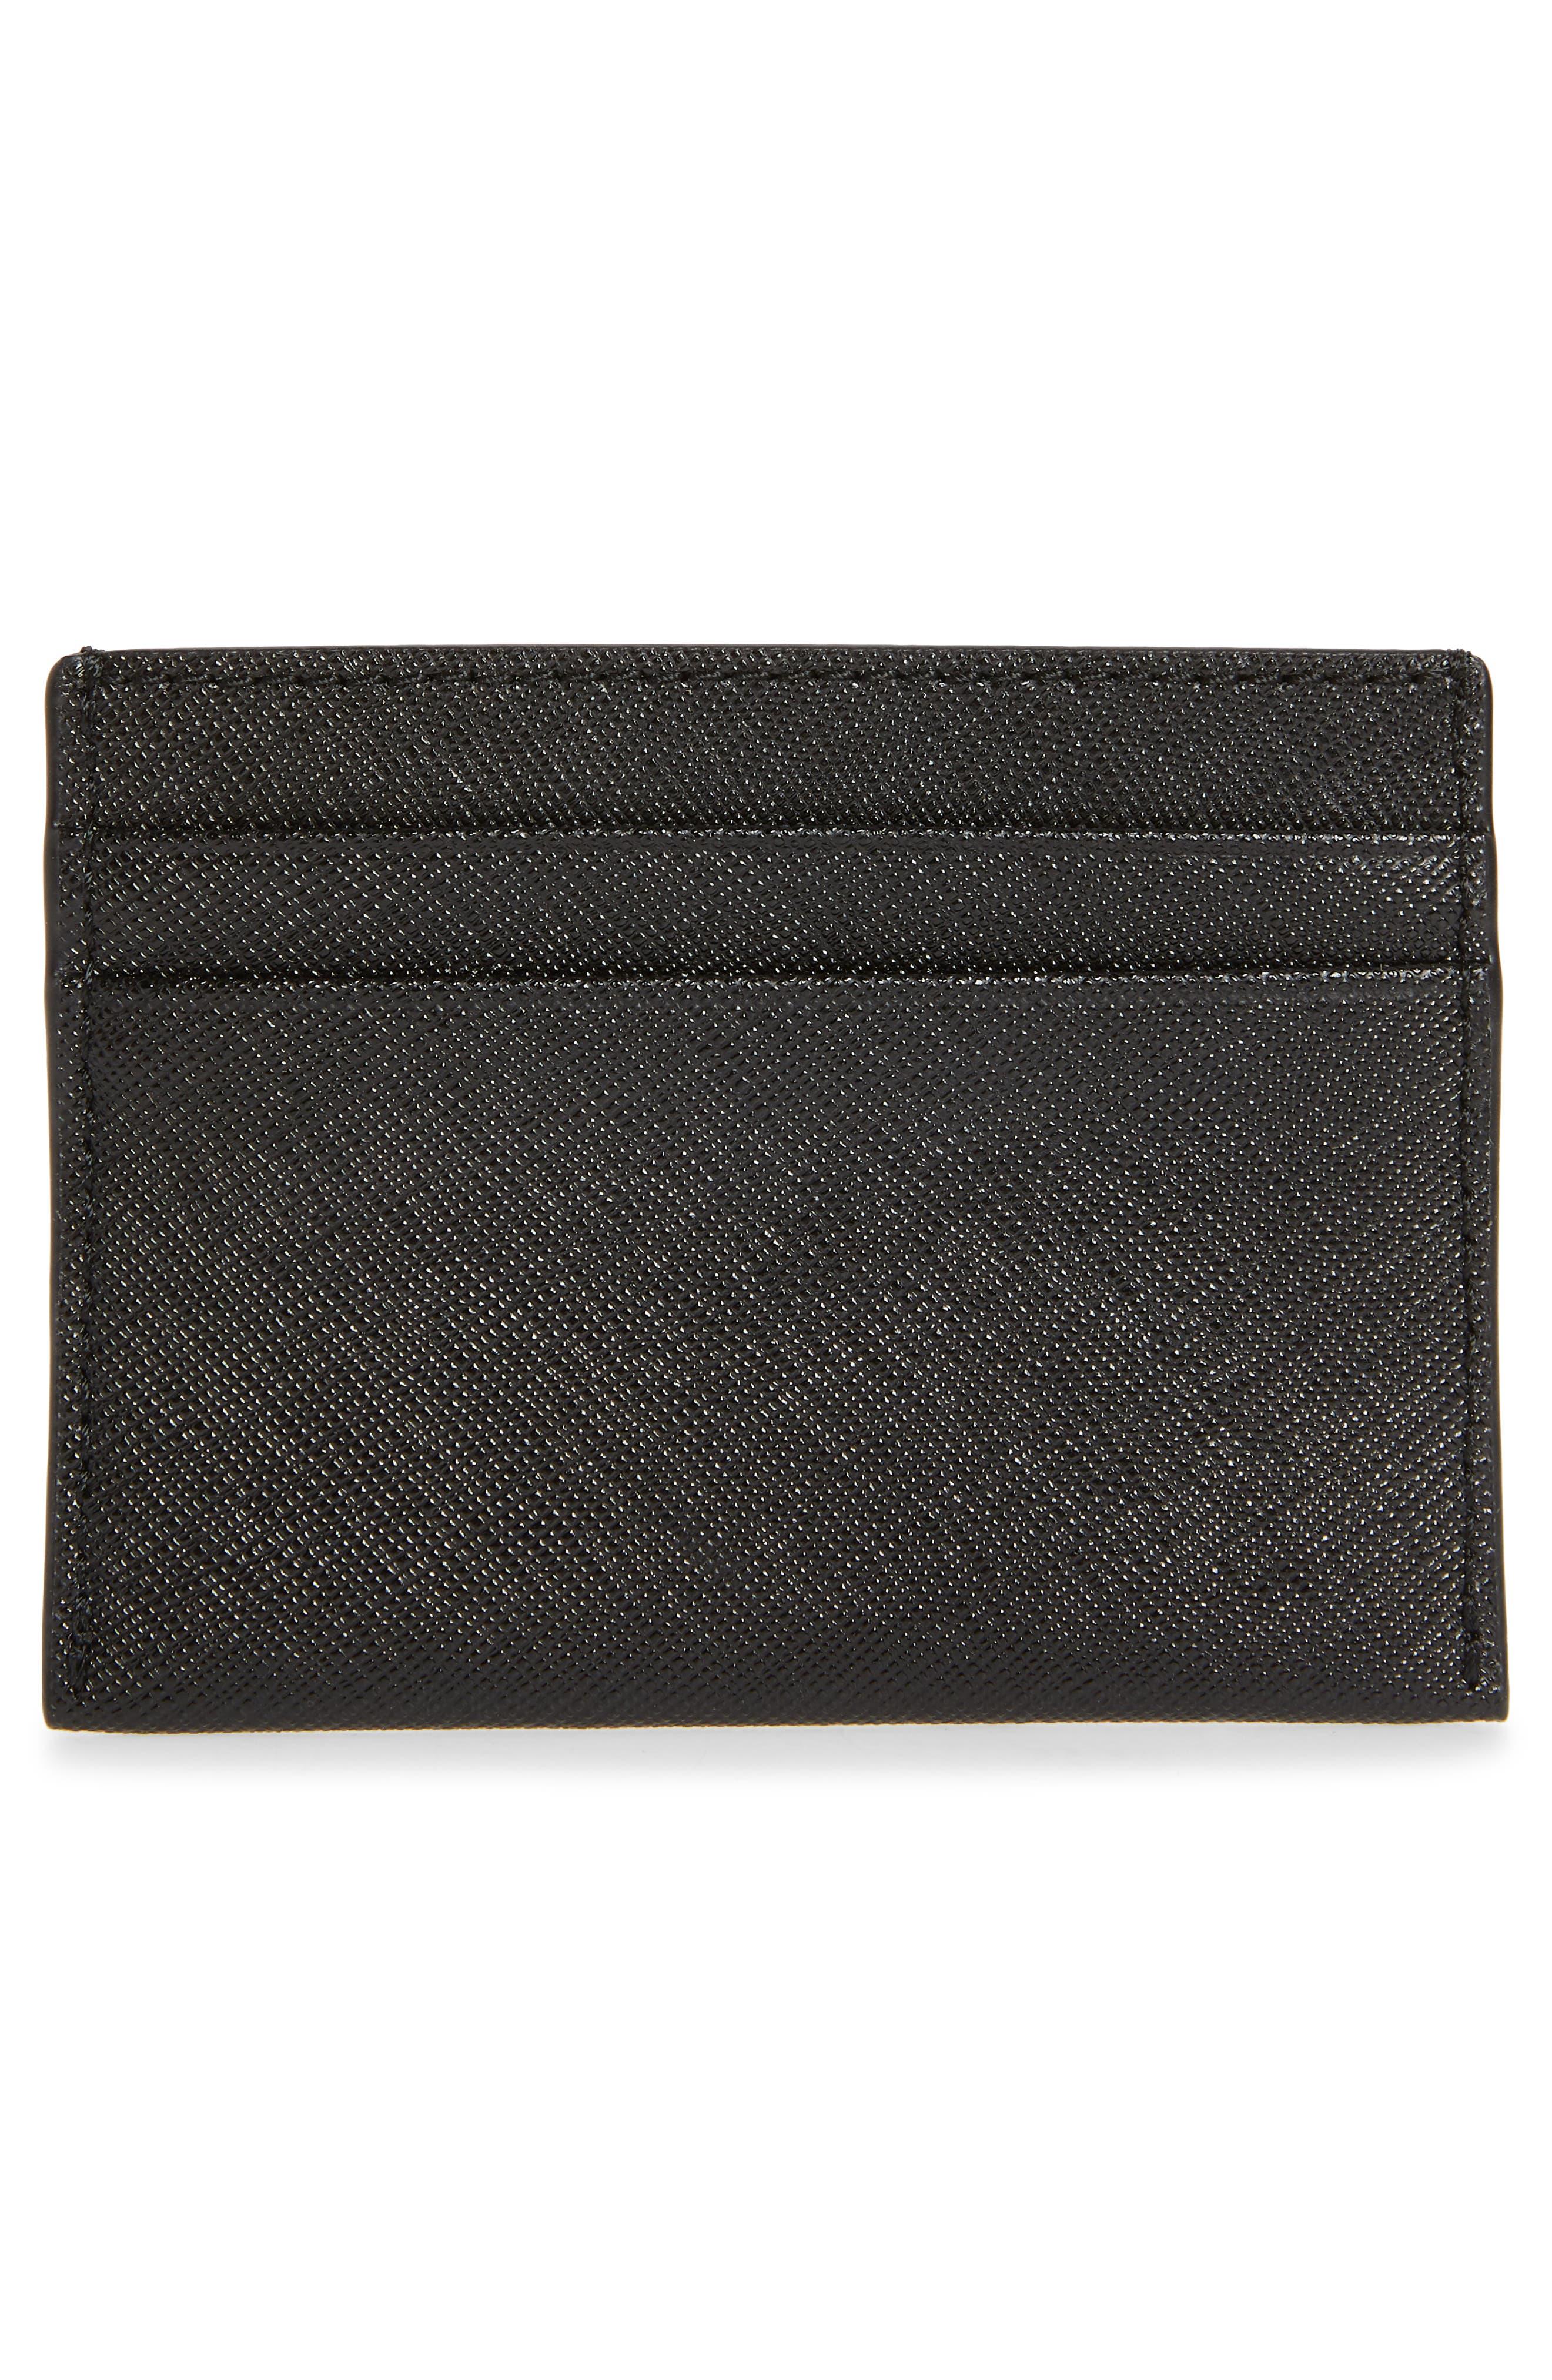 Robinson Leather Card Case,                             Alternate thumbnail 2, color,                             BLACK